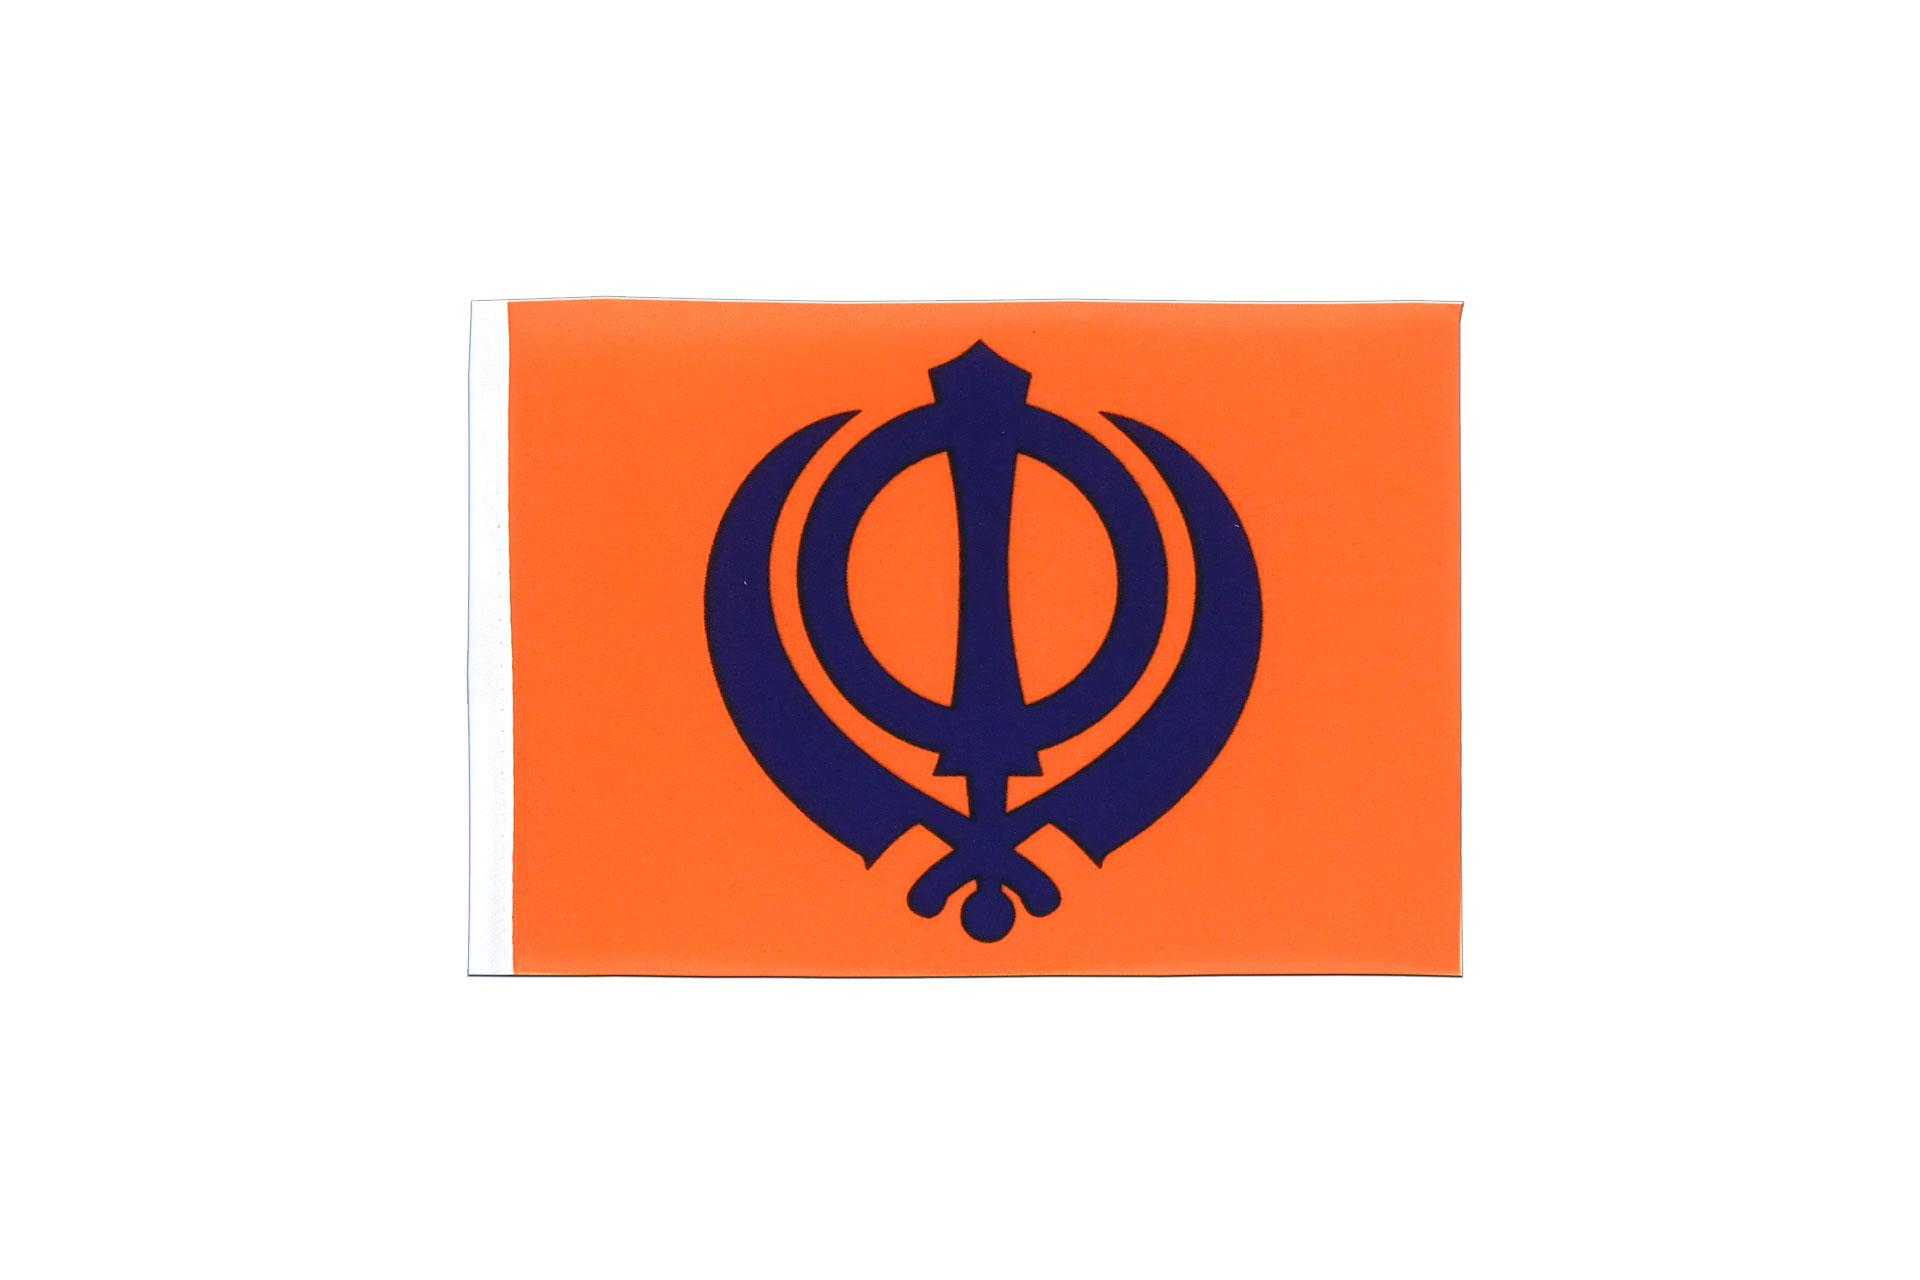 Mini flag sikhism 4x6 royal flags mini flag sikhism 4x6 biocorpaavc